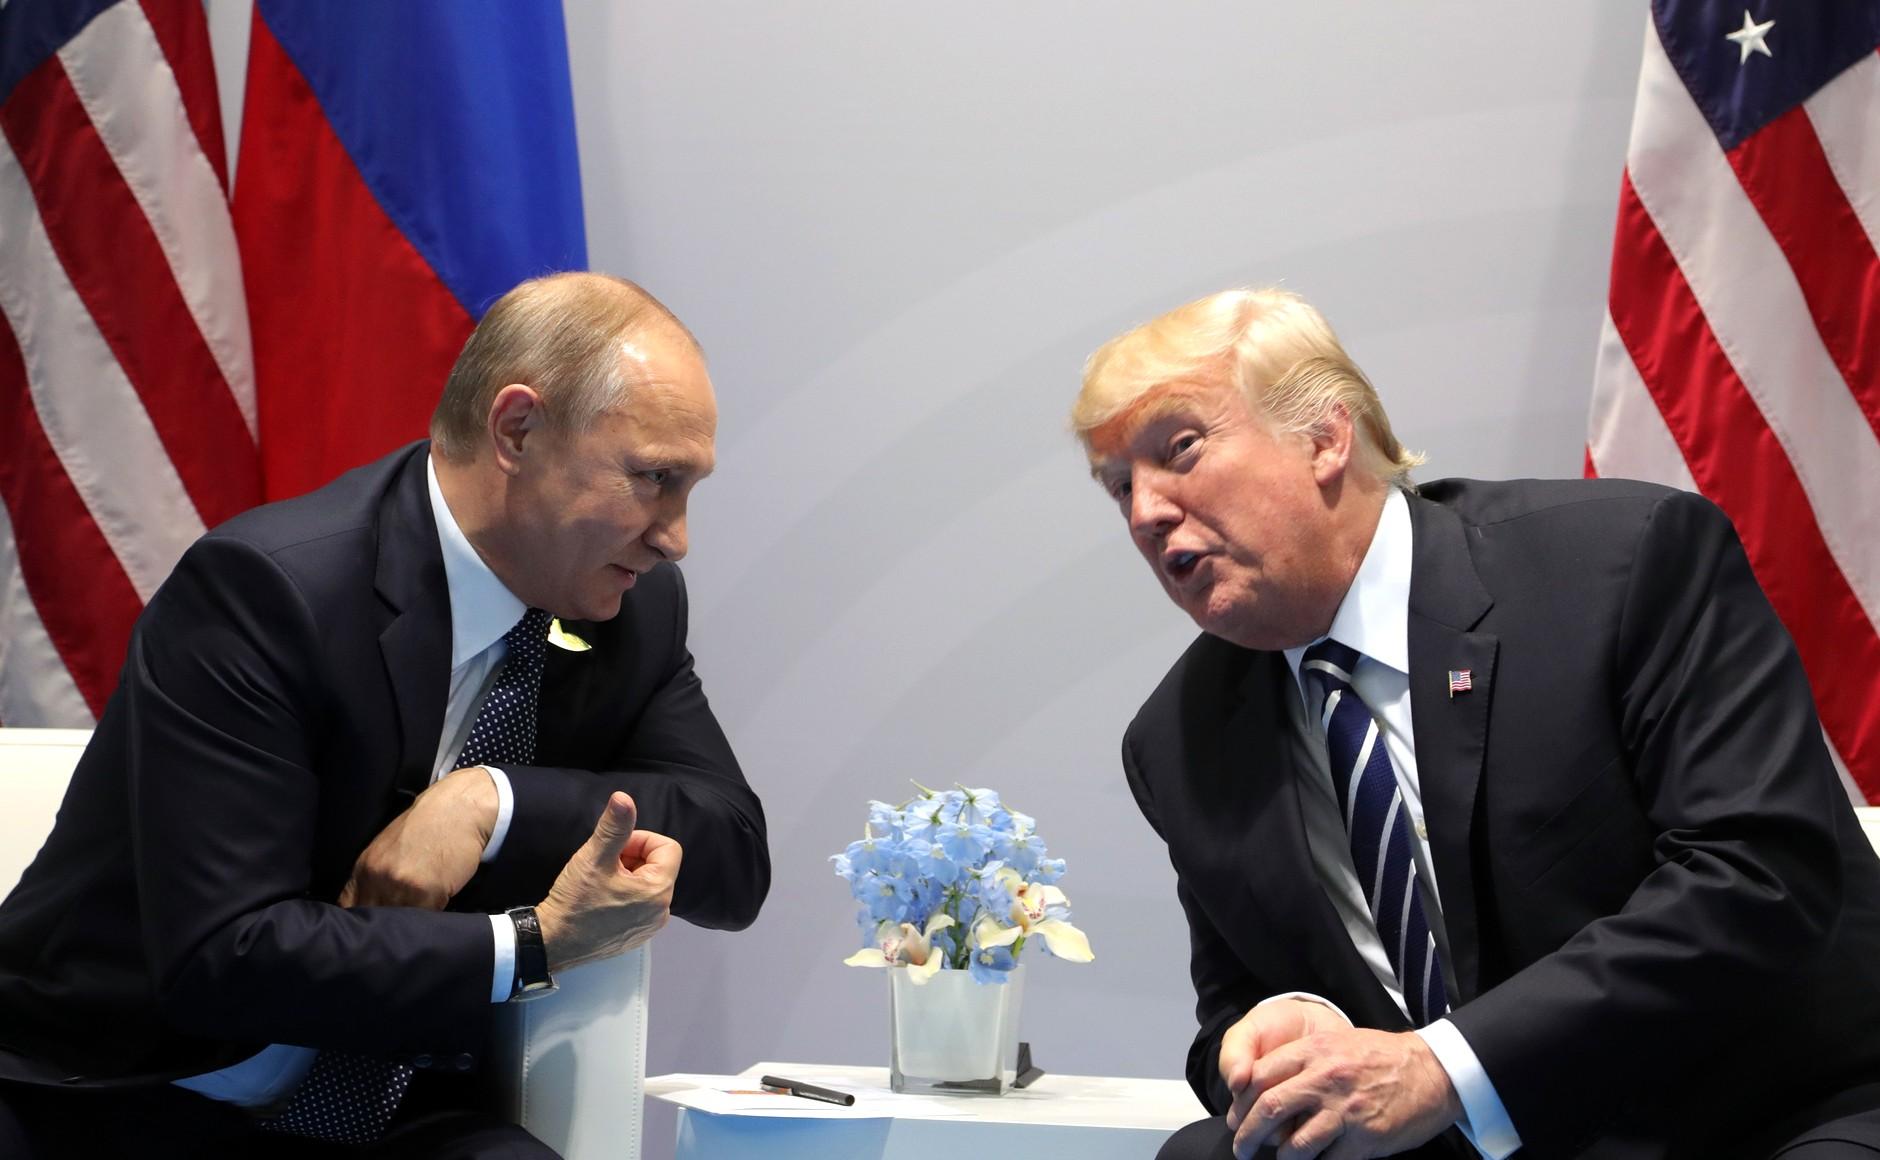 File:Vladimir Putin and Donald Trump at the 2017 G-20 Hamburg ...